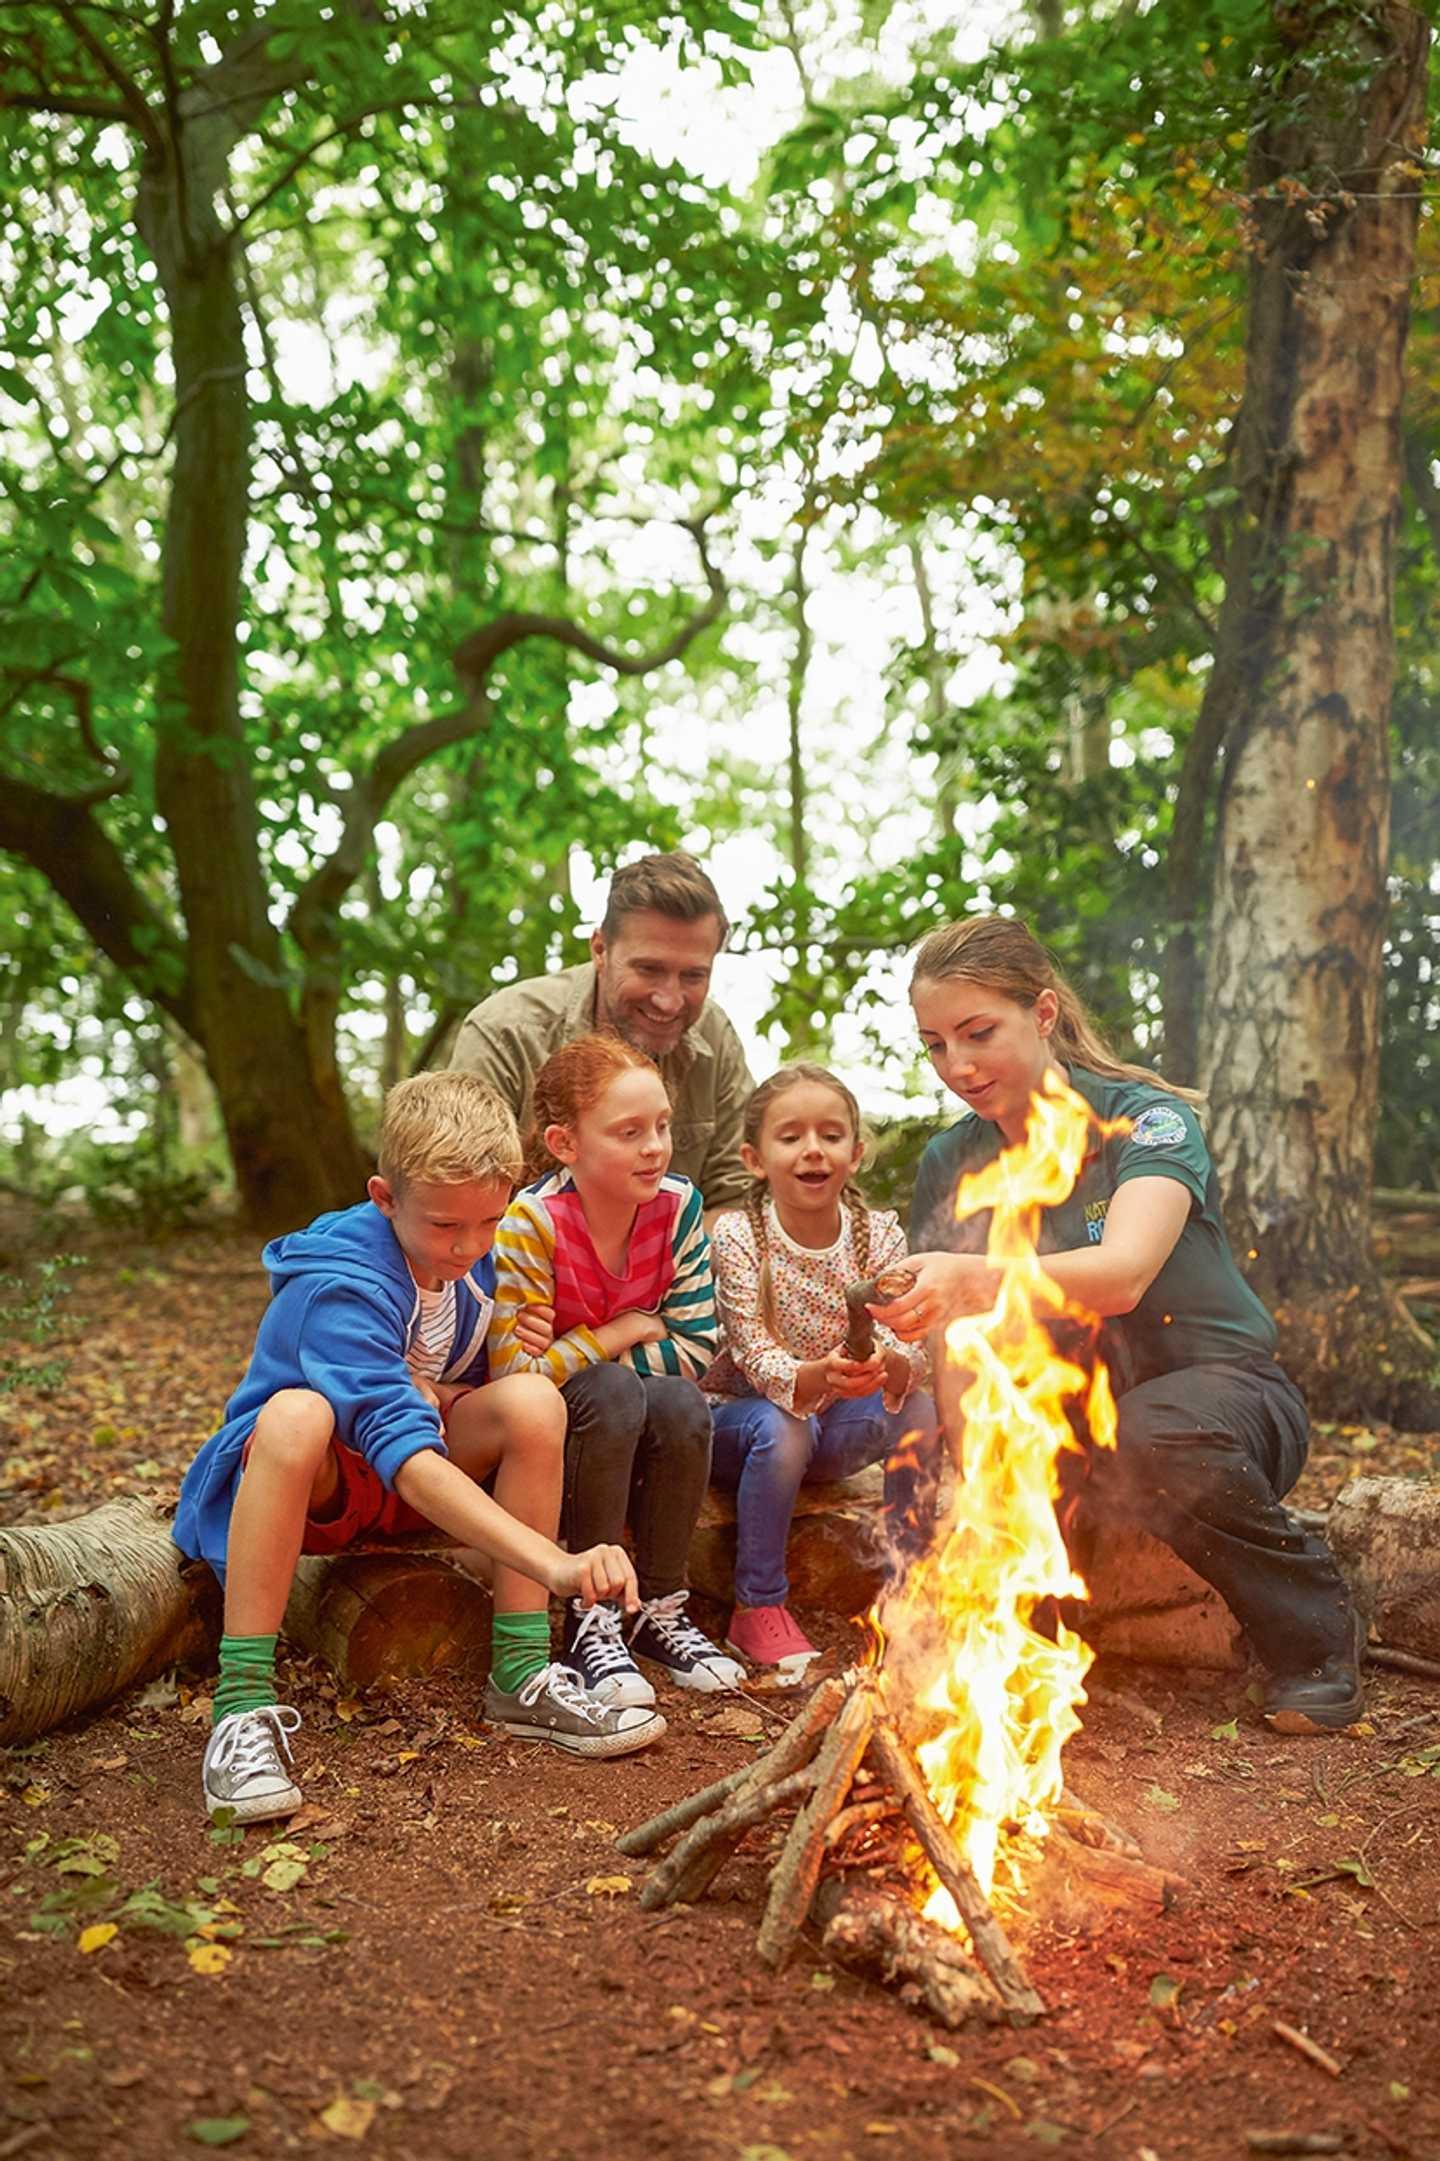 Kids and ranger firelighting